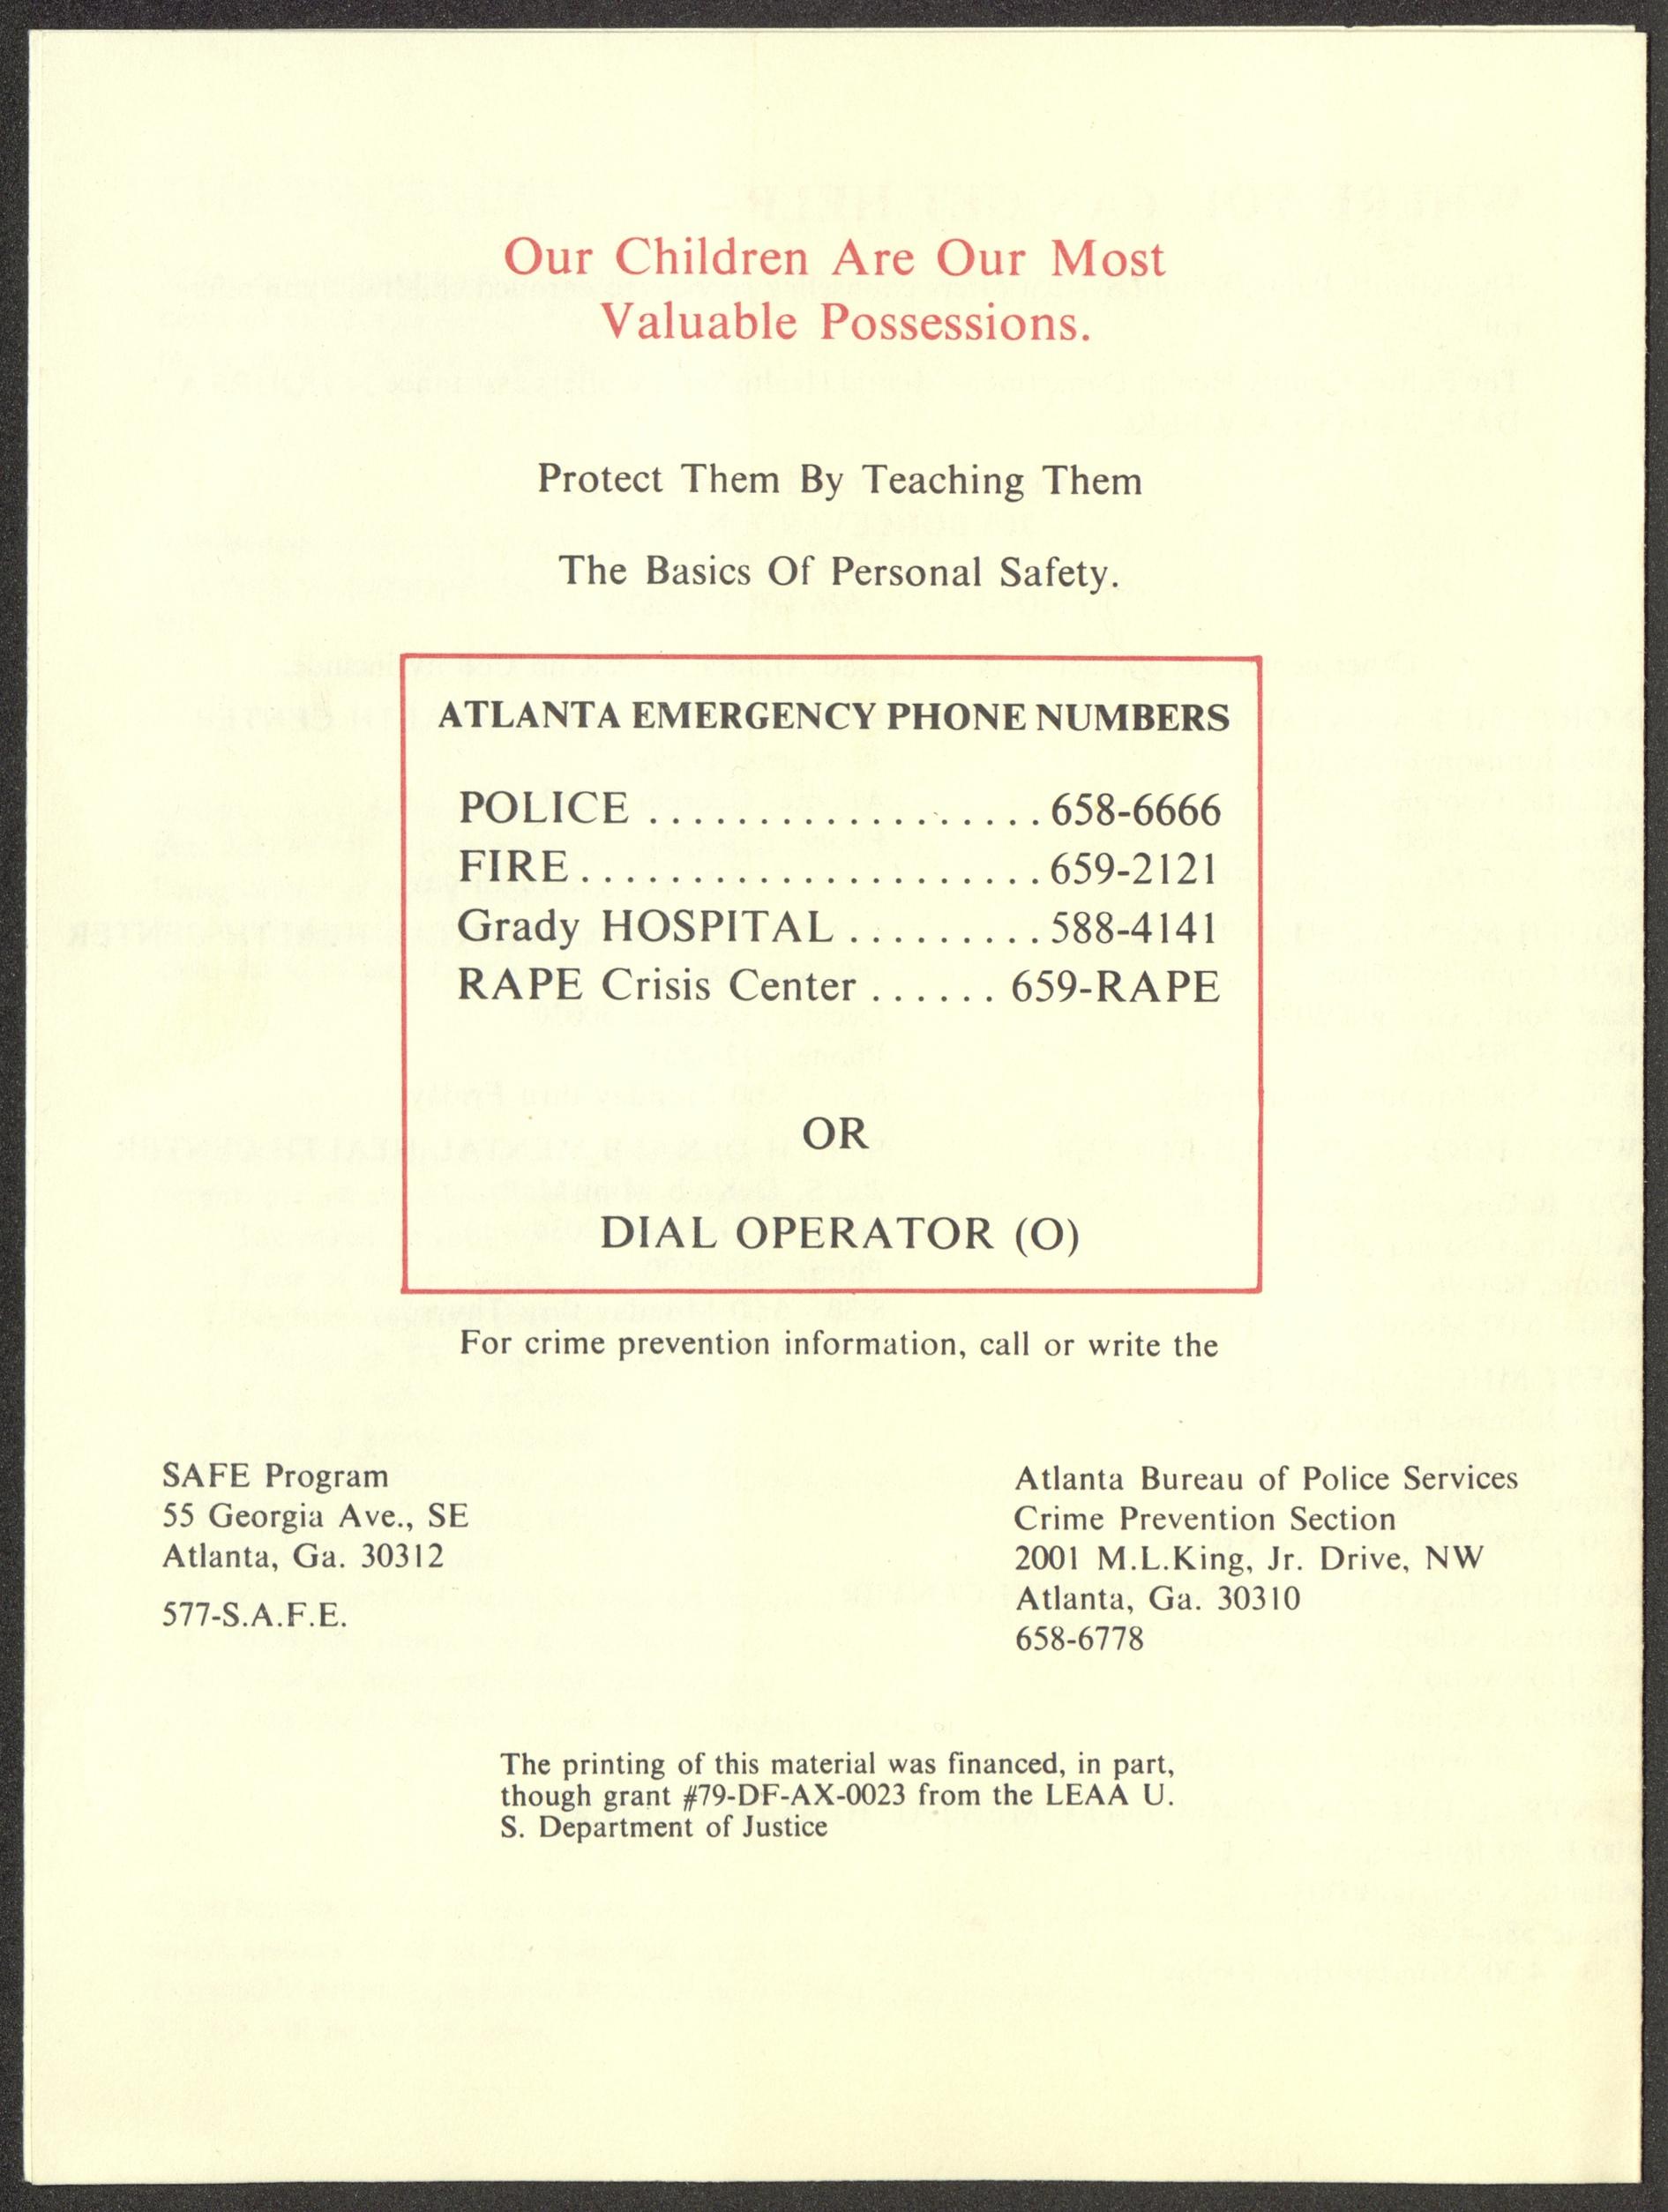 Maynard Jackson 1938-2003 circa 1981 Maynard Jackson mayoral administrative records